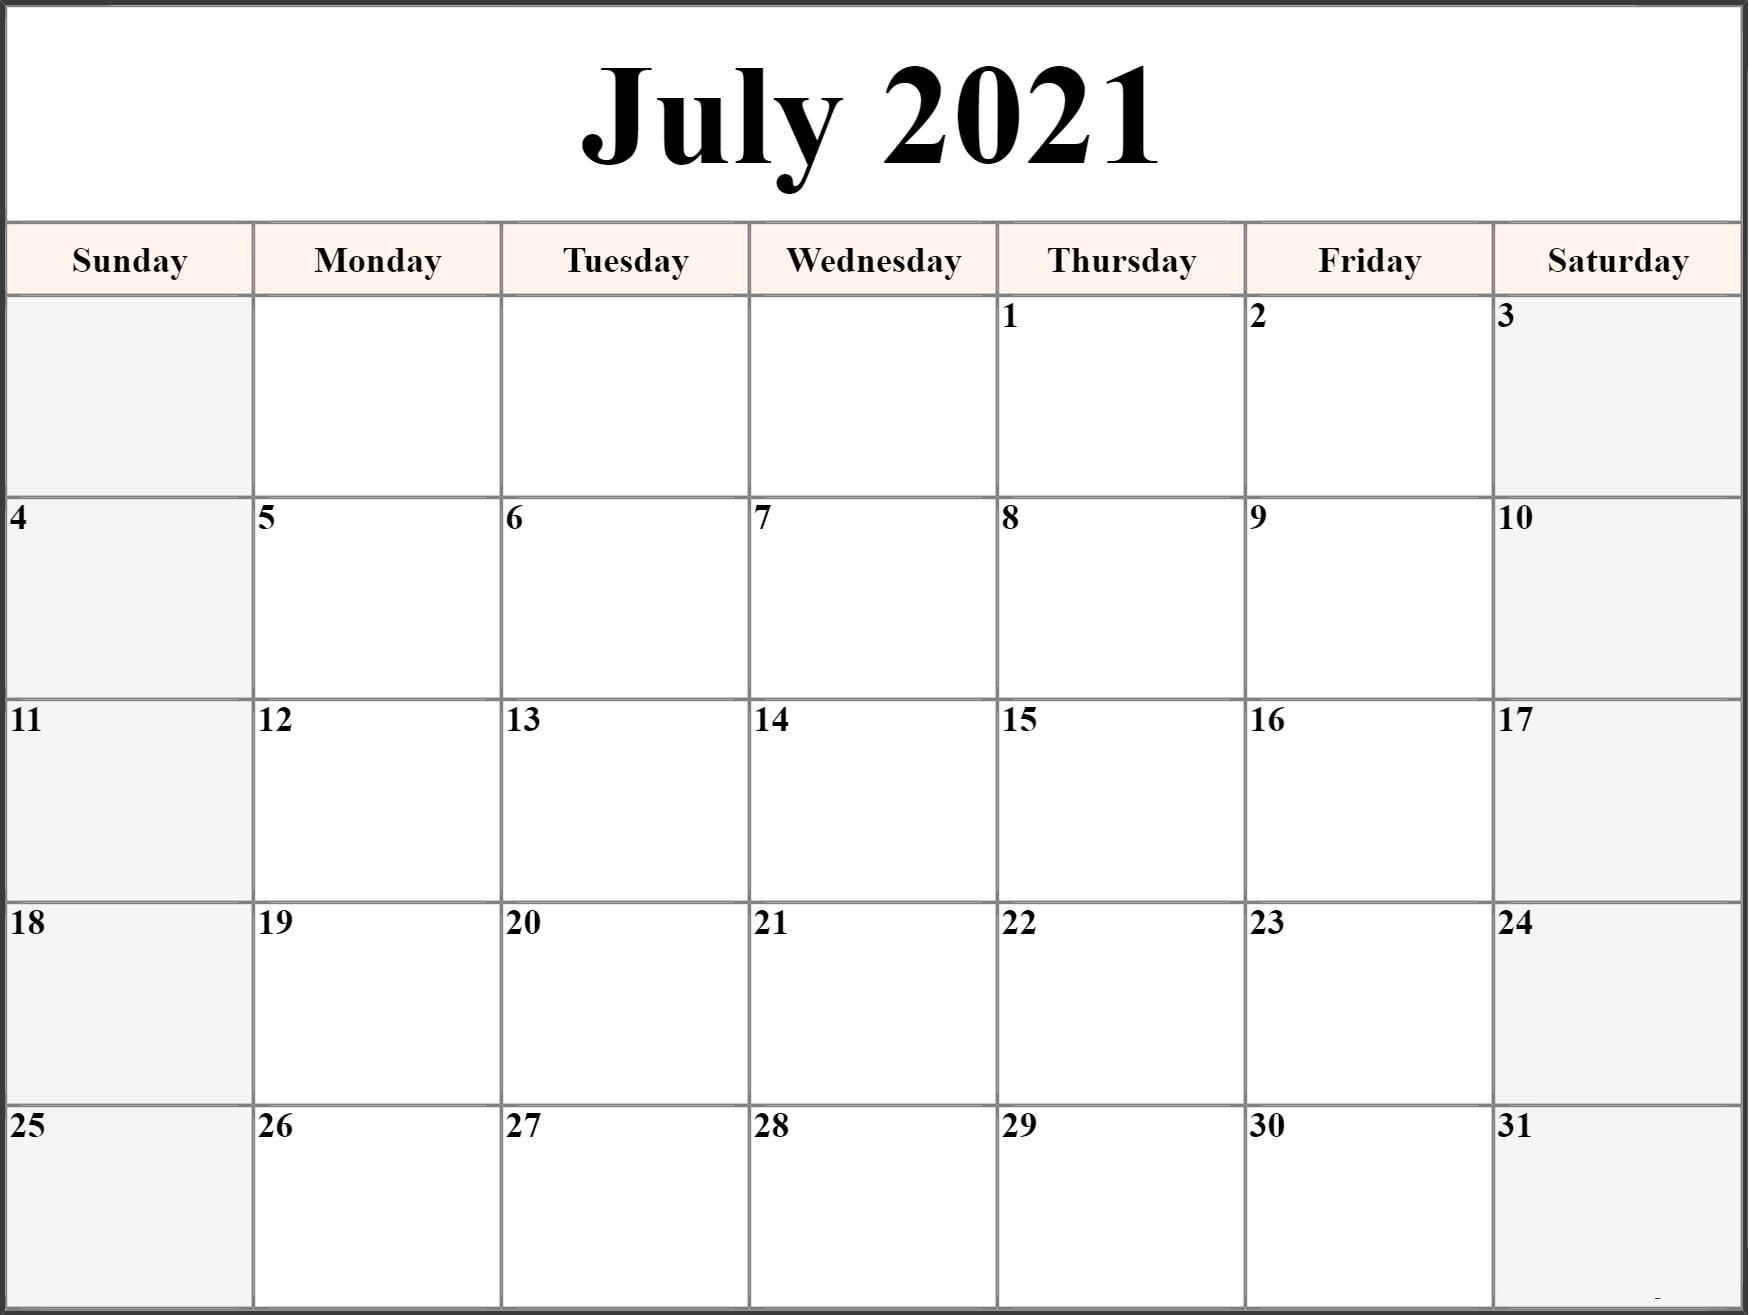 free printable july 2021 calendar template in pdf word calendar dream::Blank July 2021 Calendar Free